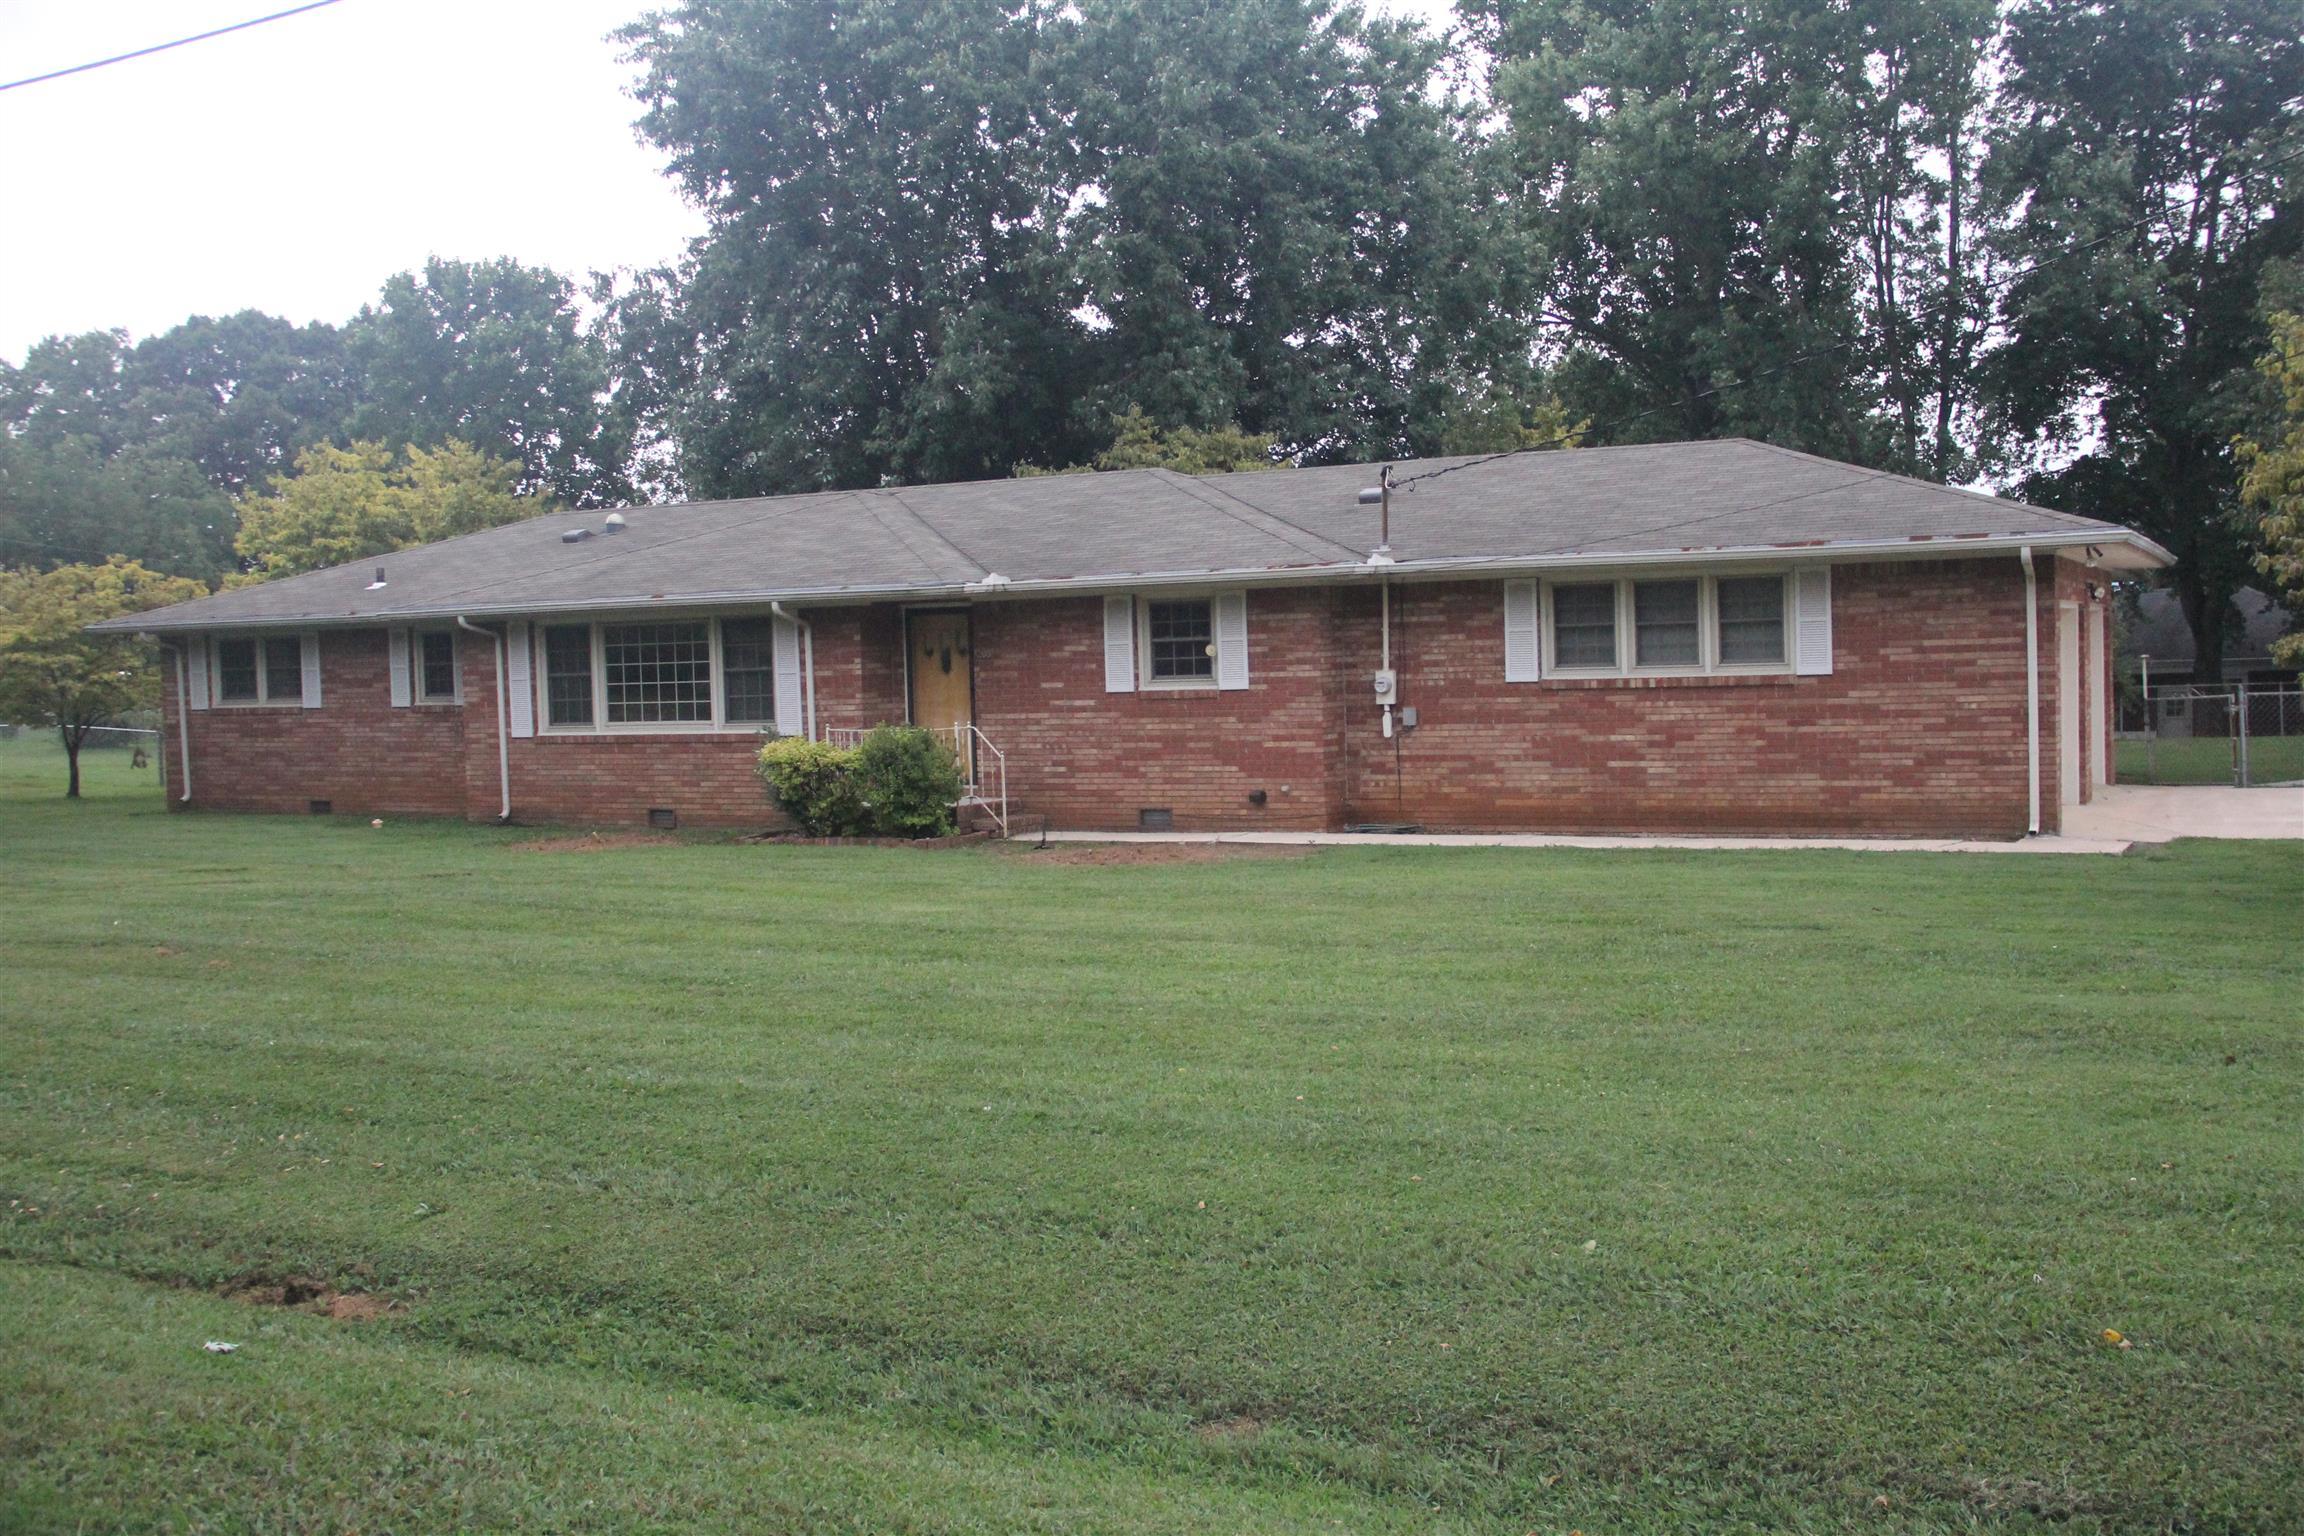 203 Woodland Dr, Decherd, TN 37324 - Decherd, TN real estate listing